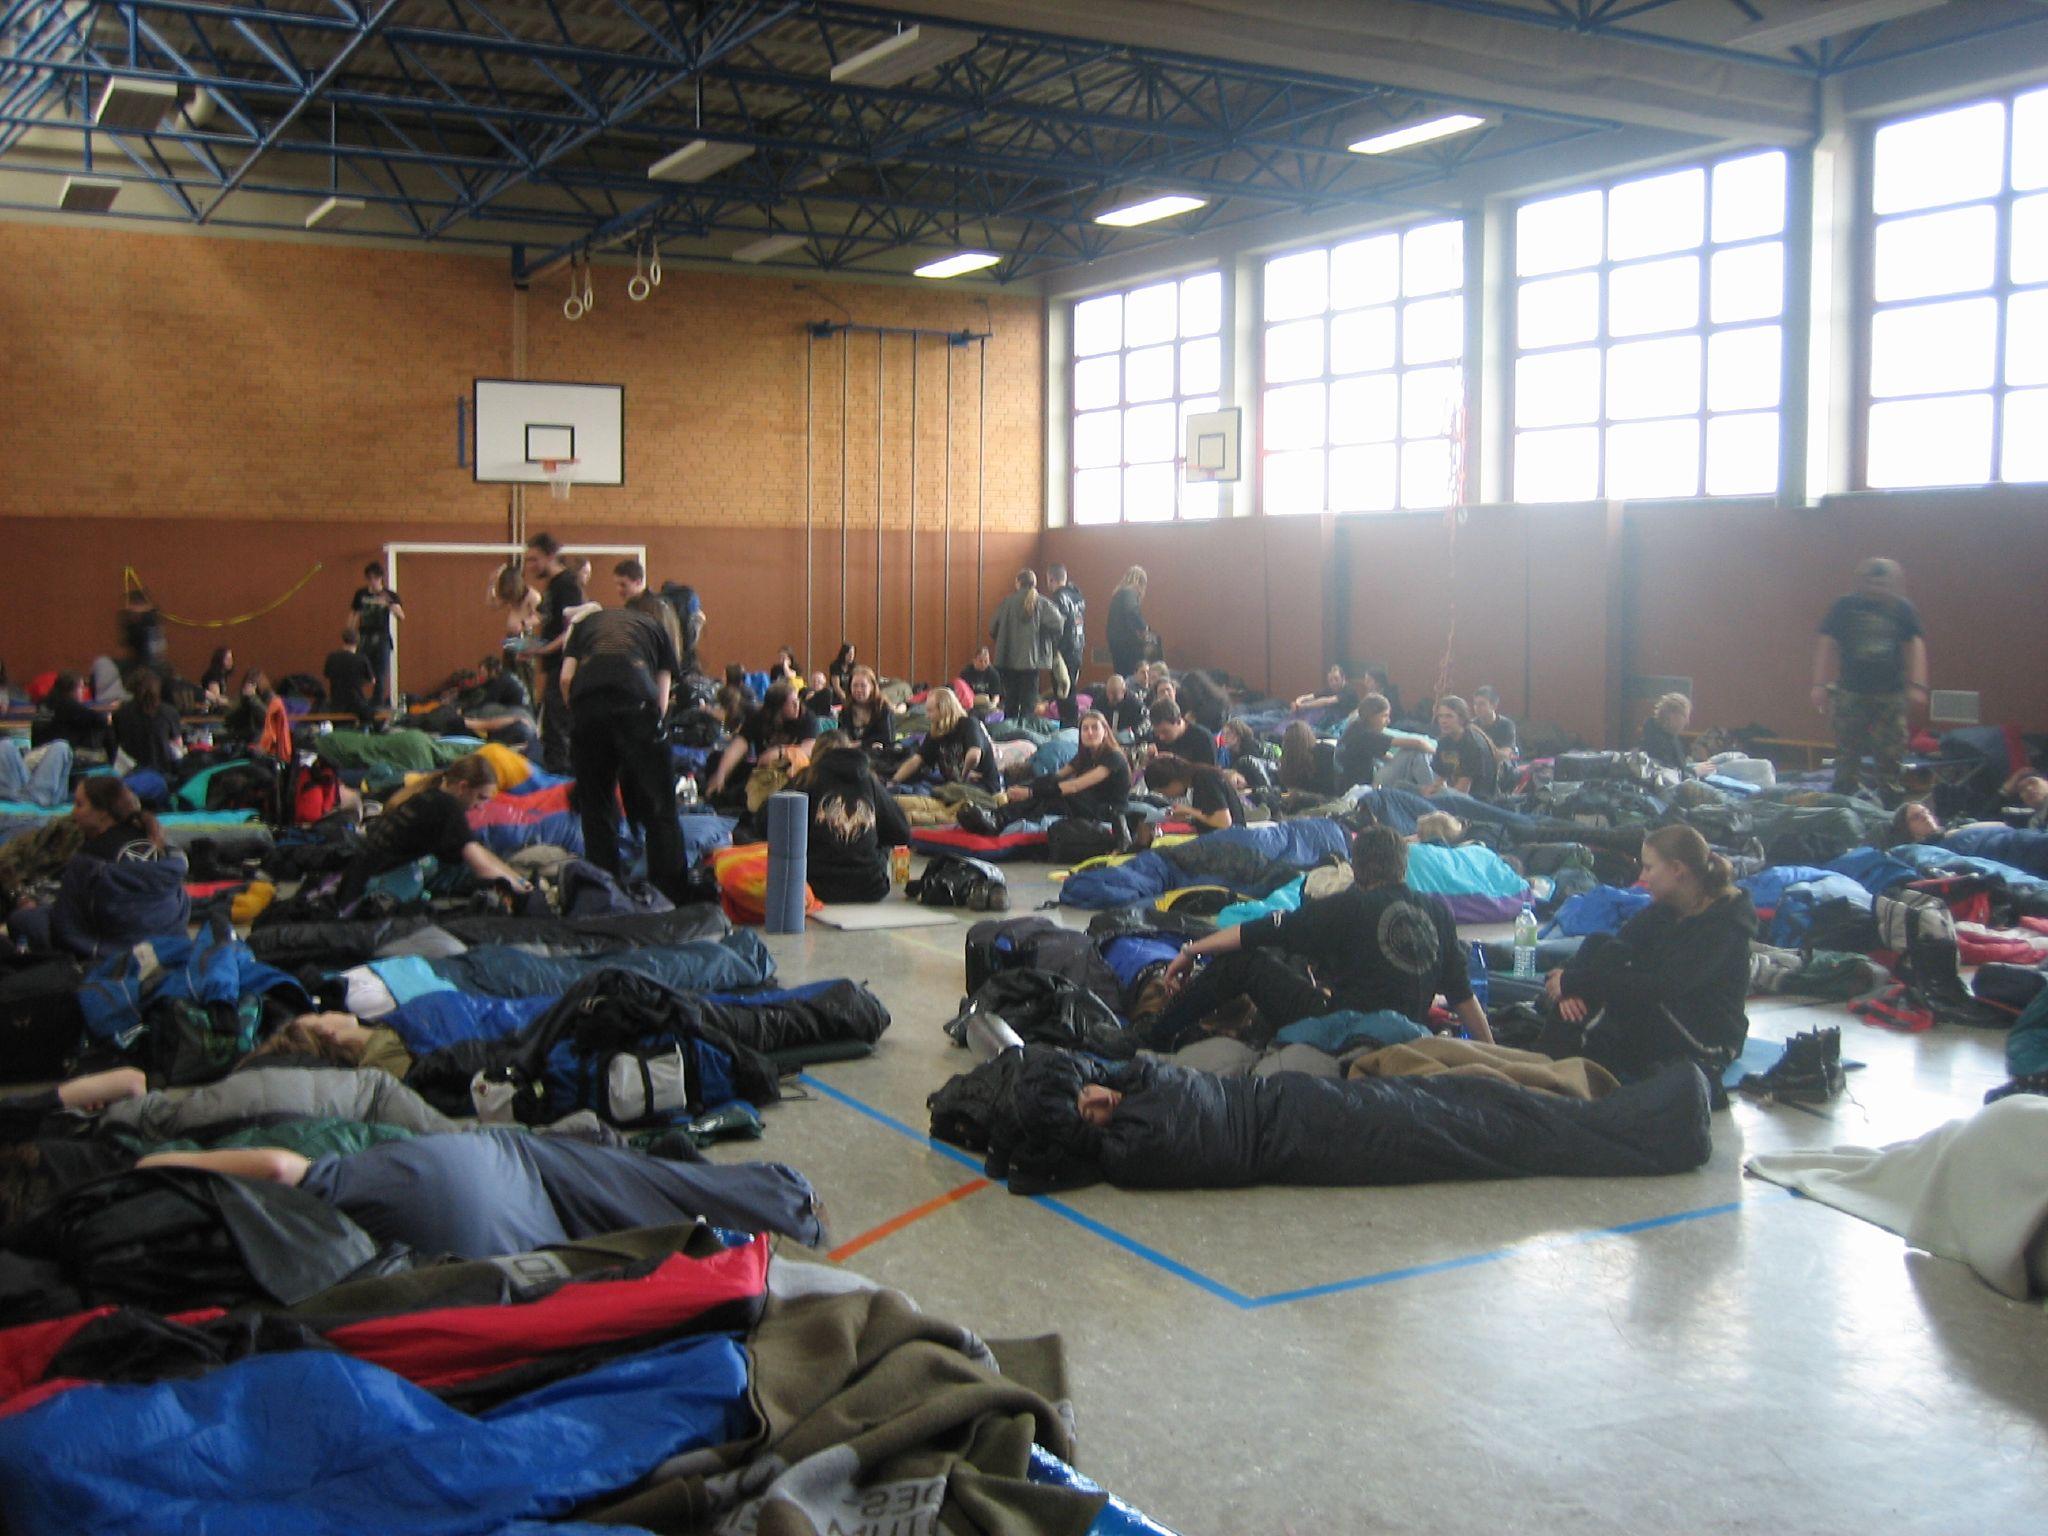 Datei:Ragnarök-Festival 2007, sleeping hall 2.jpg - Wikipedia